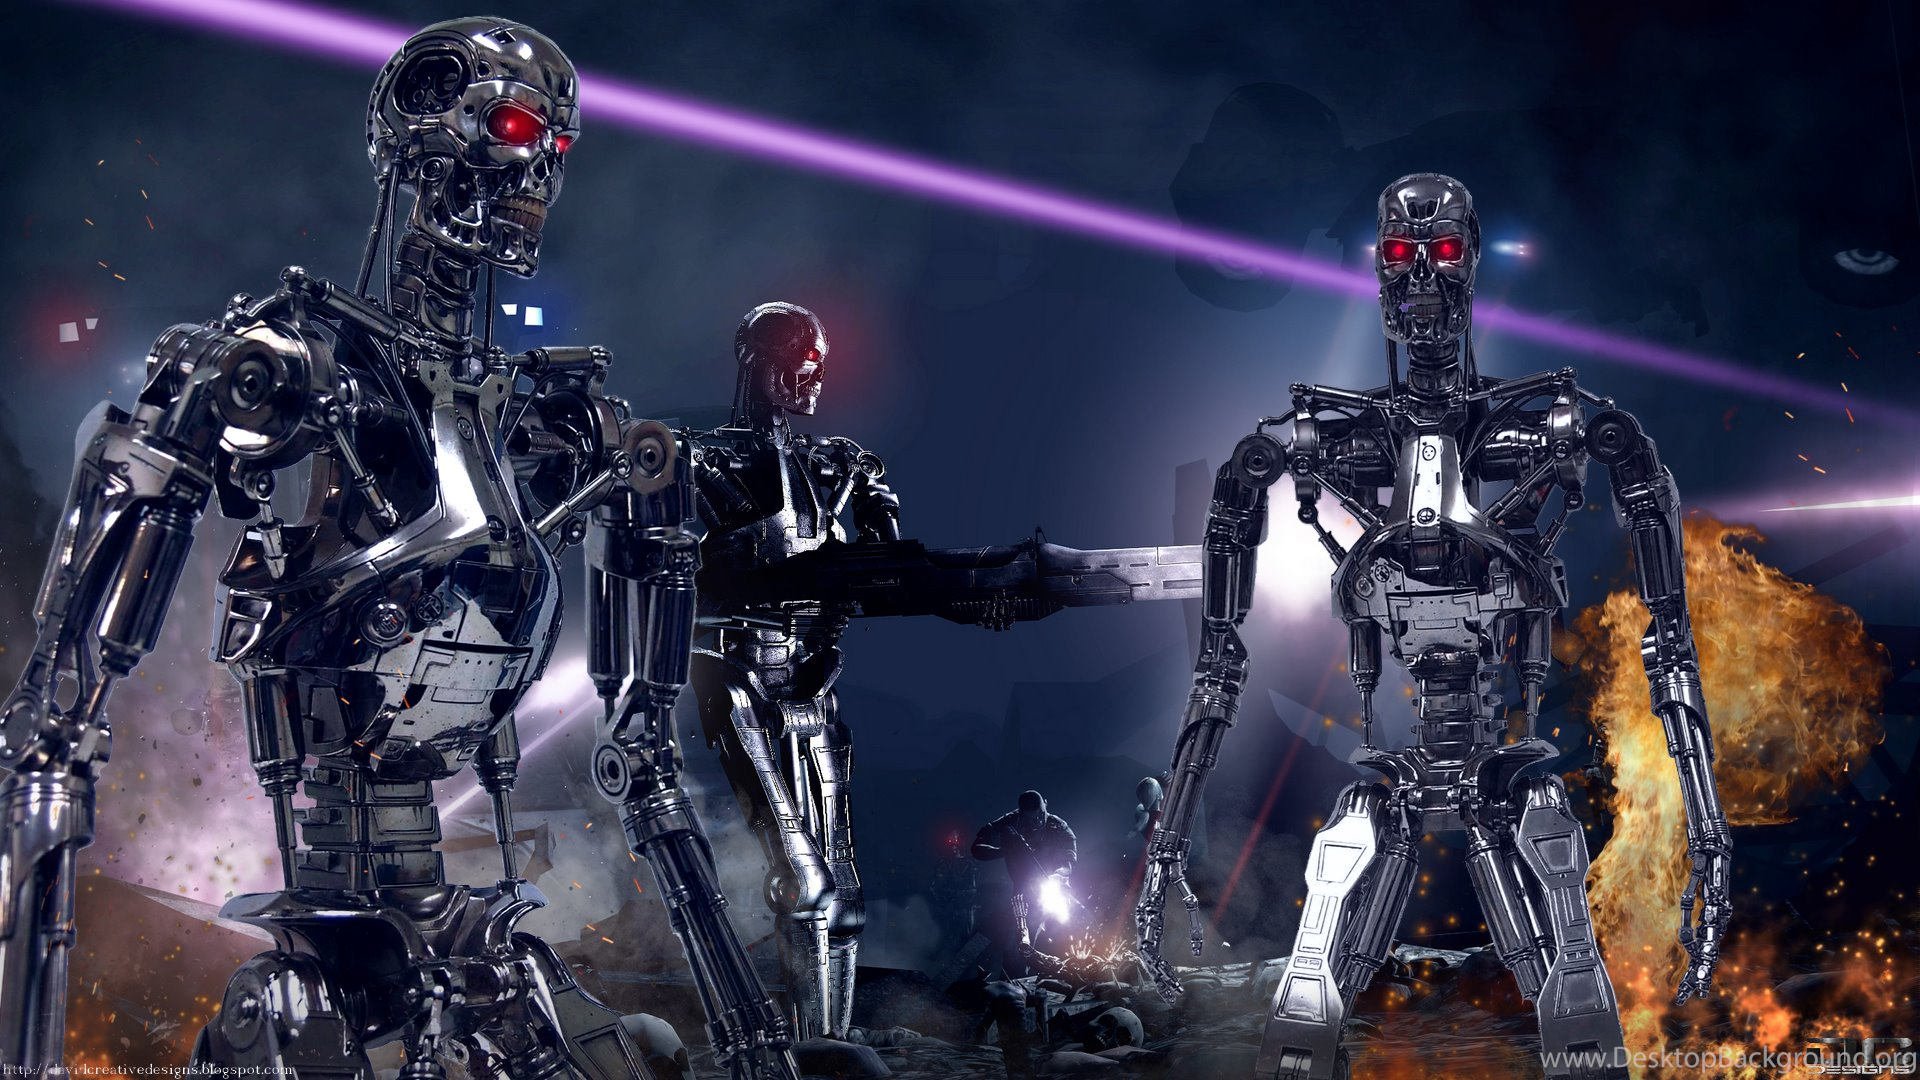 252 terminator hd wallpapers desktop background - Terminator 2 wallpaper hd ...